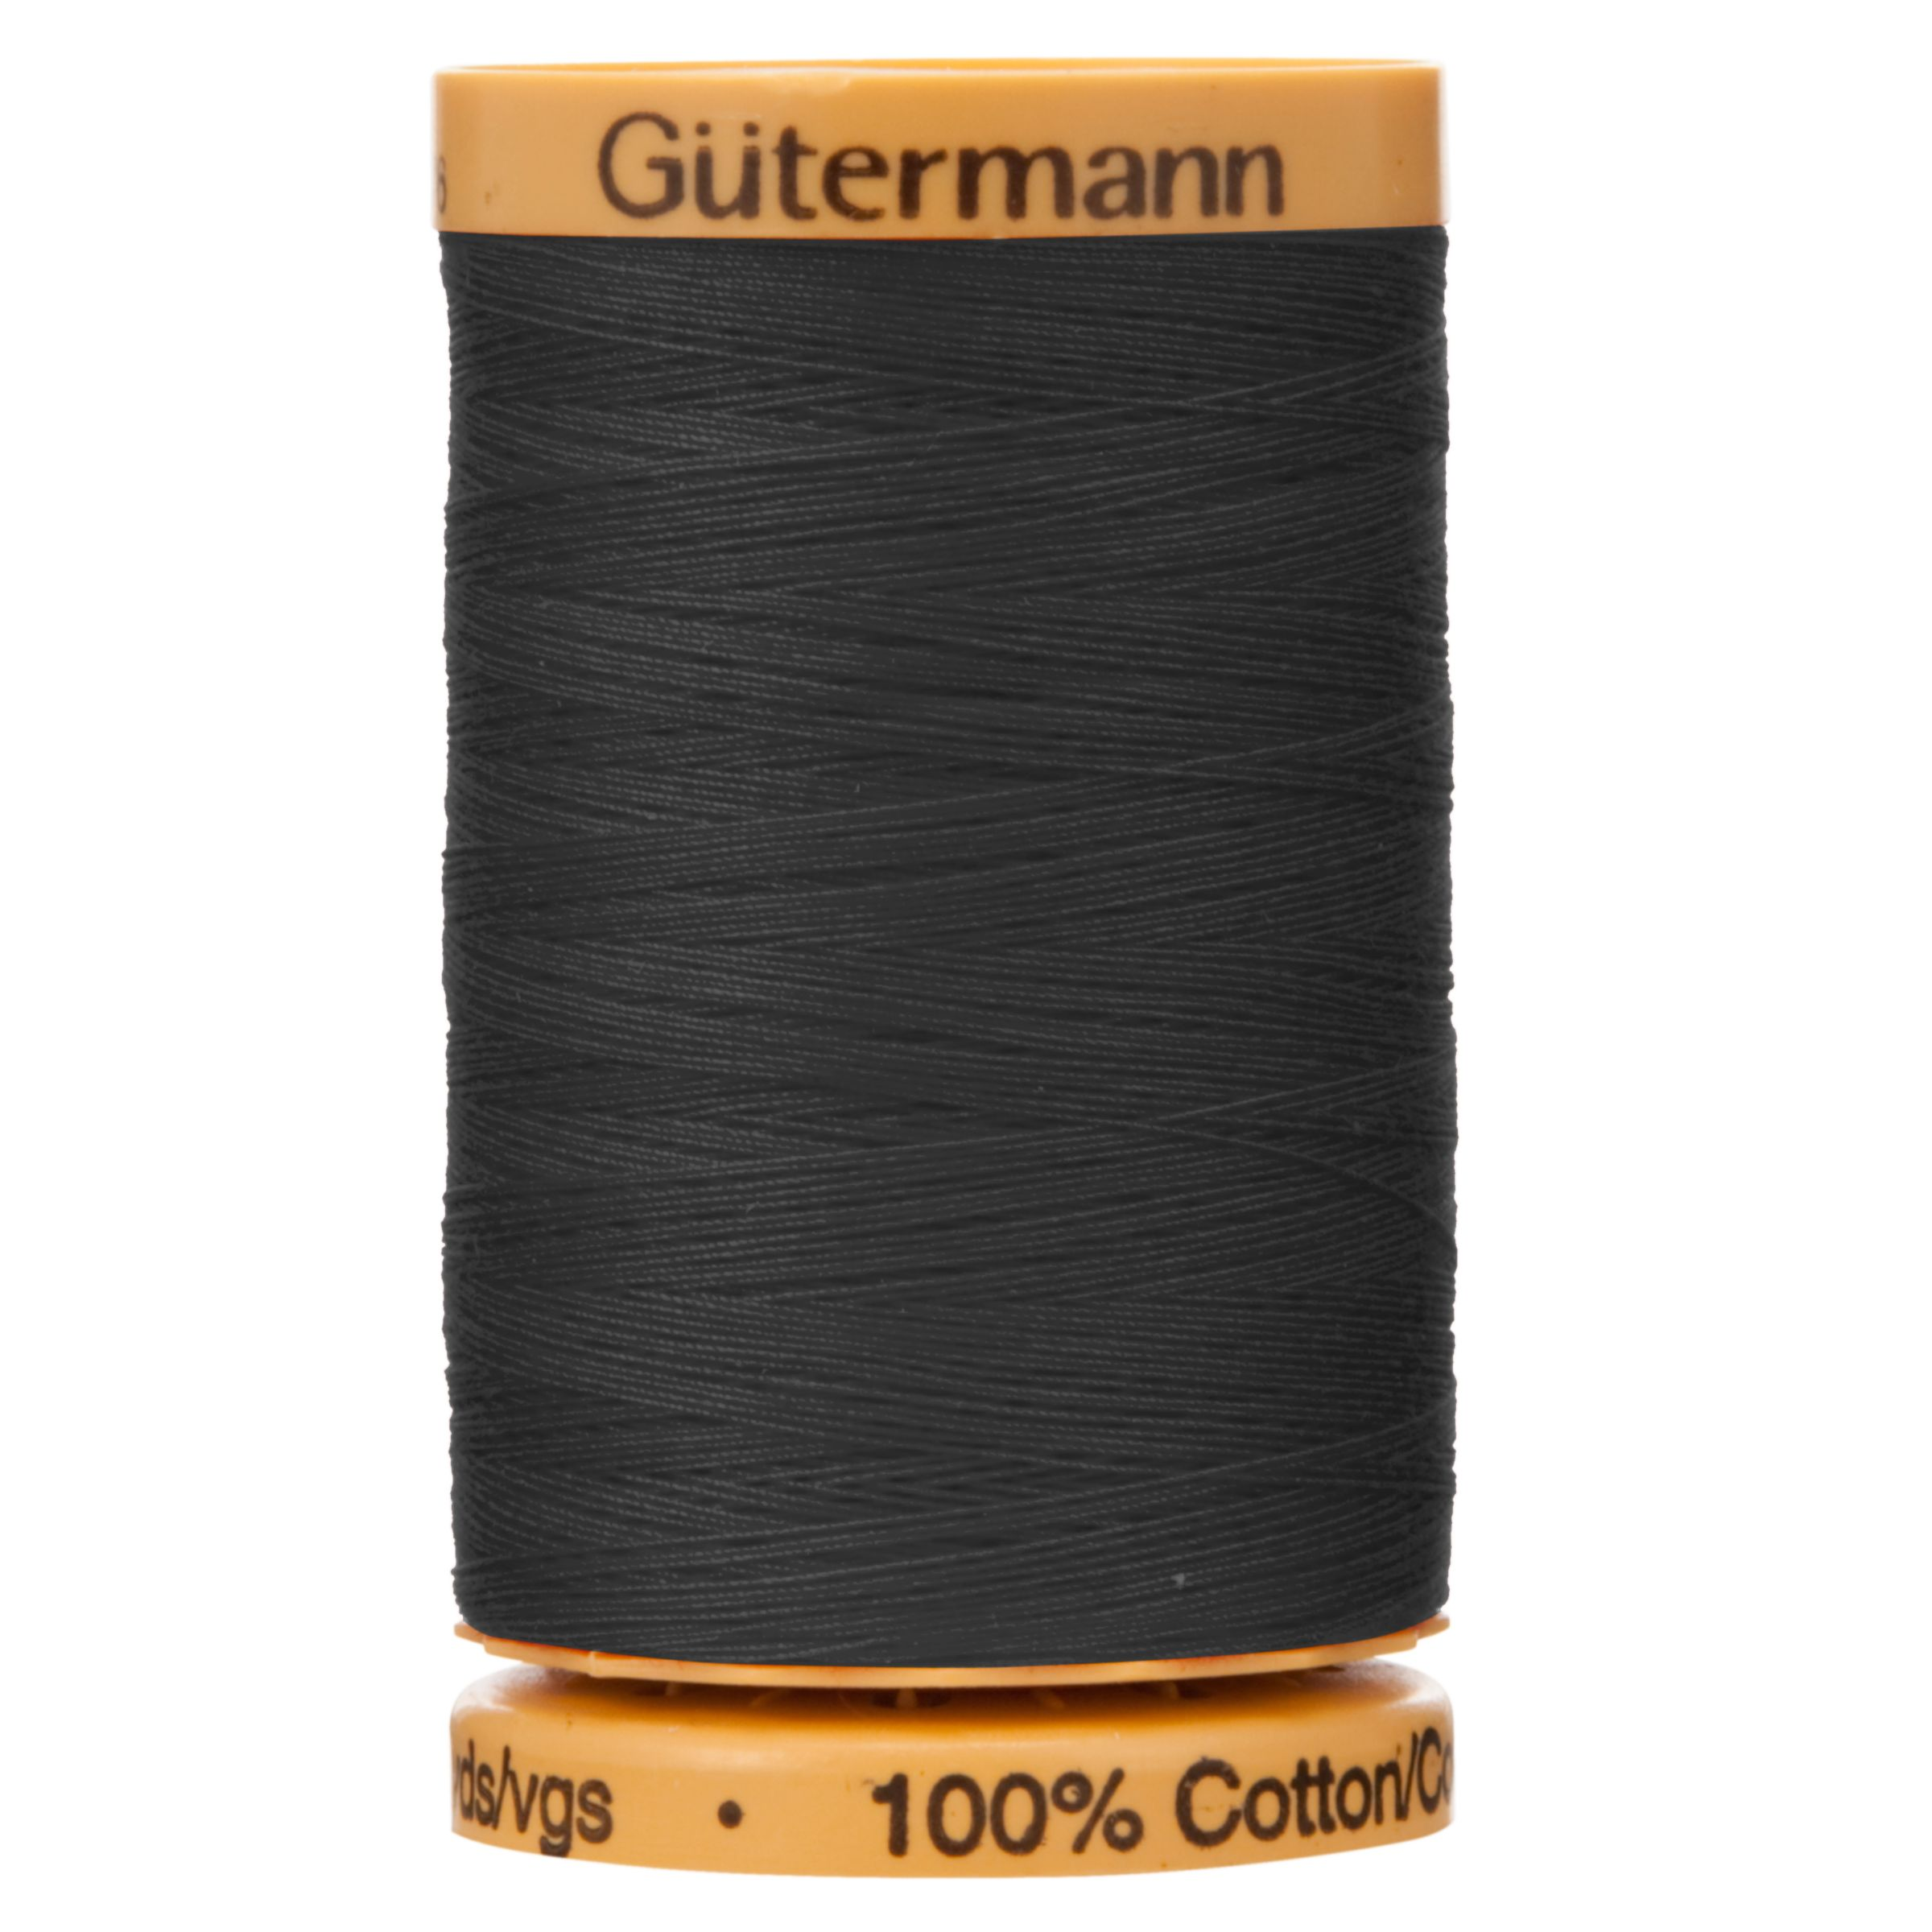 800m Gutermann  Natural Cotton Thread 5201 Black